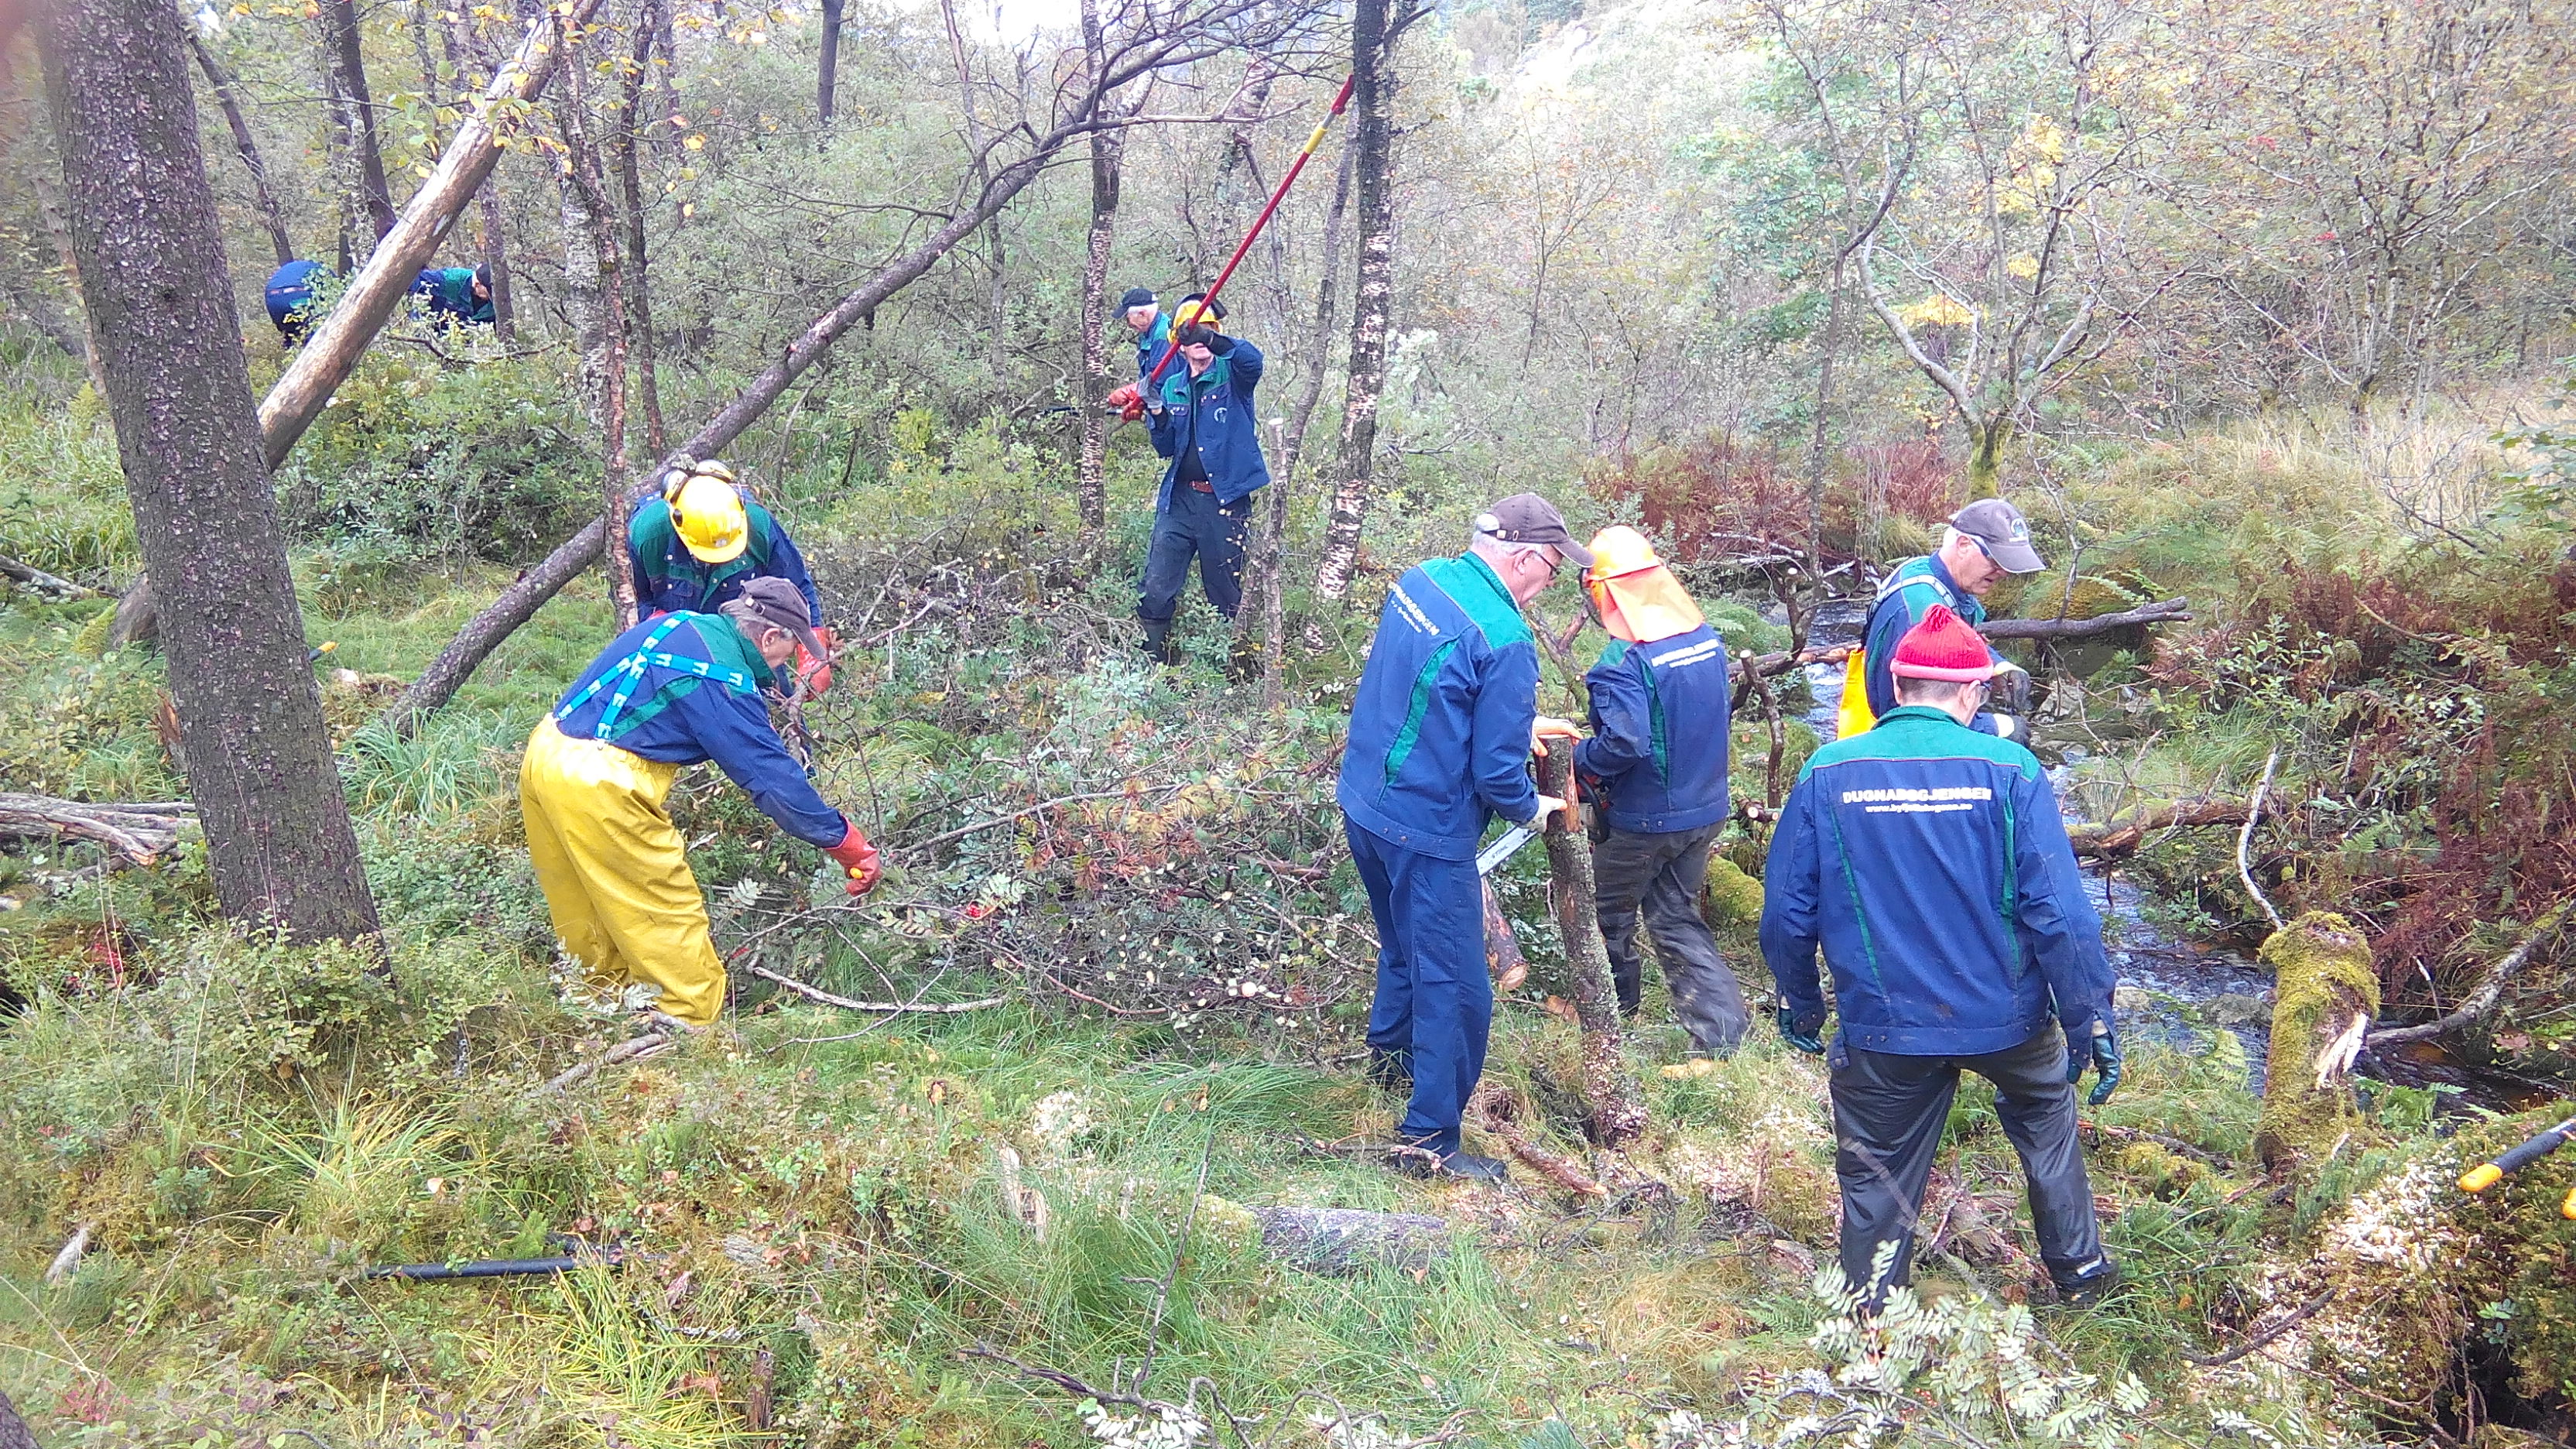 008  Tungt skogsarbeid ved Storevannet.jpg